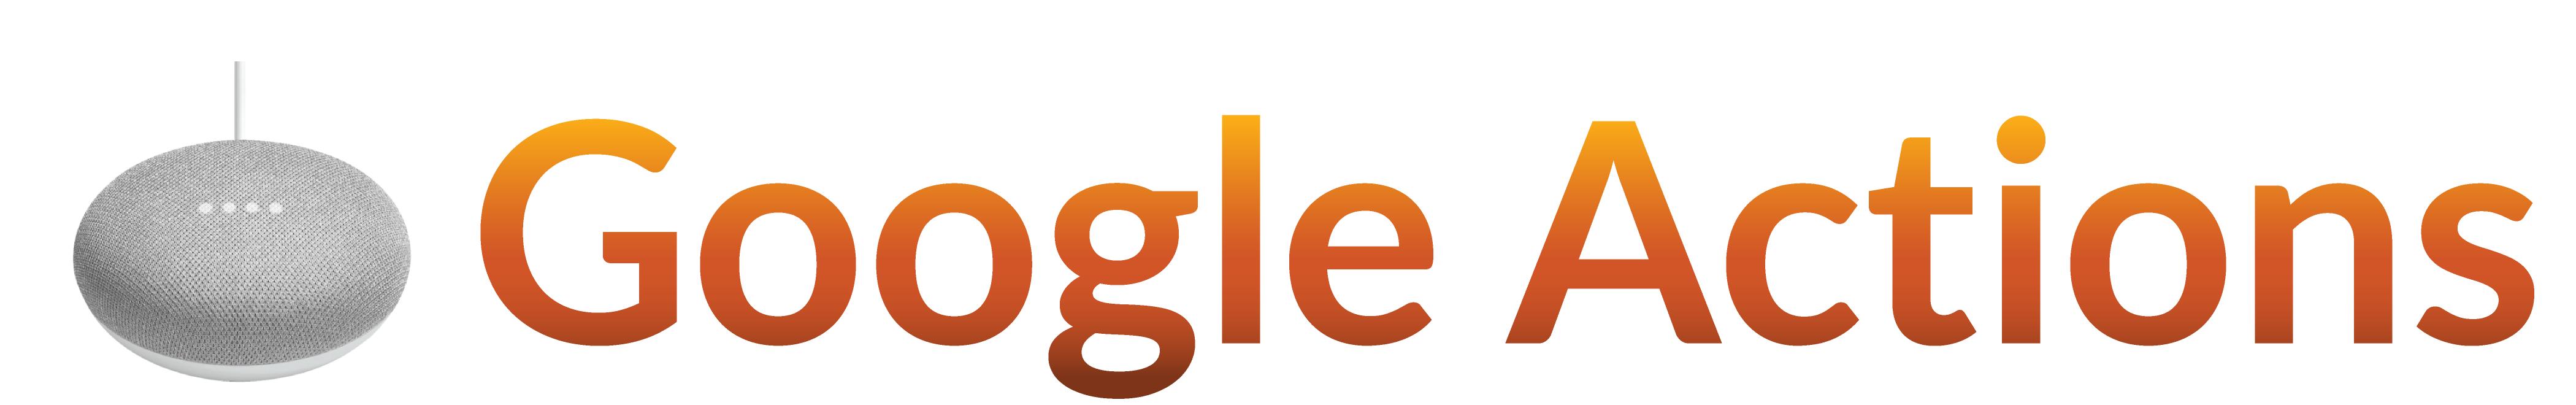 Google Action logo